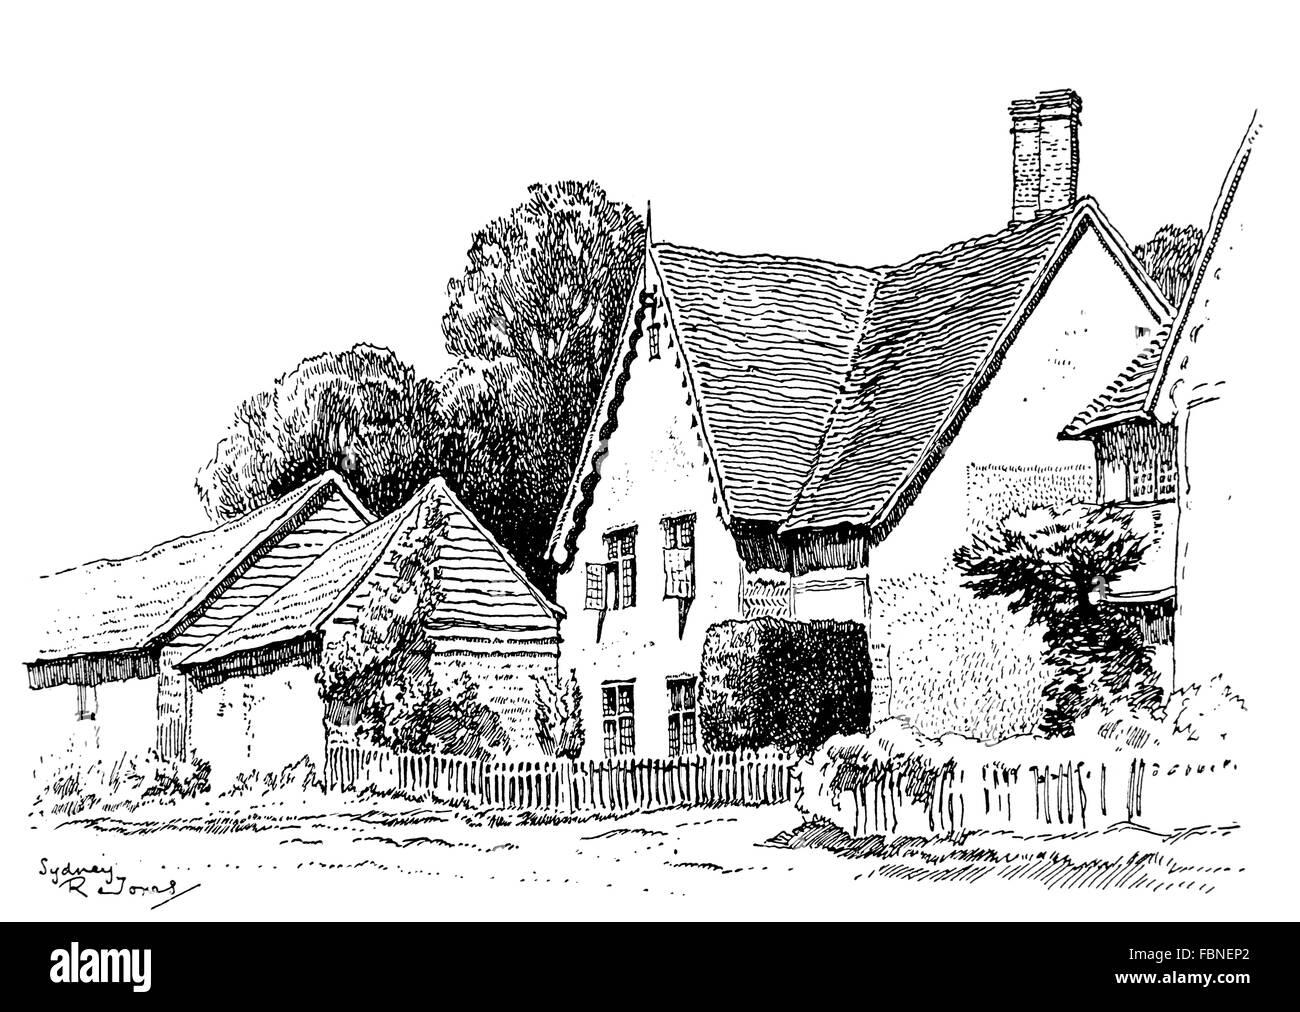 UK, England, Buckinghamshire, Dinton village, old country cottage, 1911 line illustration by, Sydney R Jones - Stock Image